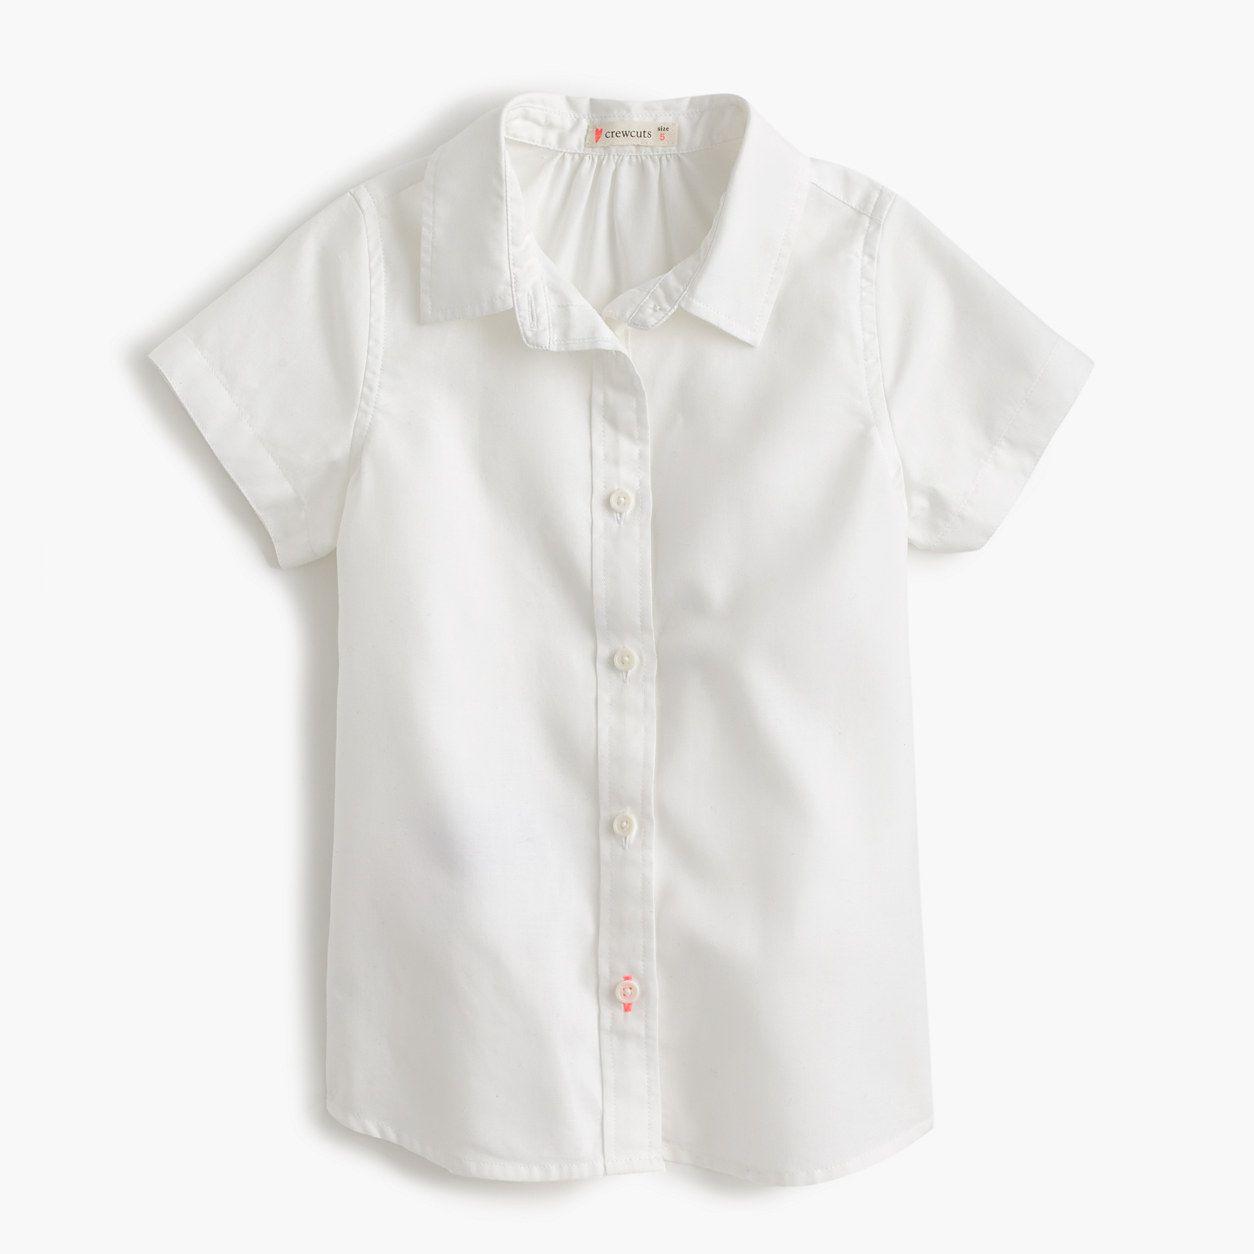 4049d41079f crewcuts Girls Short-Sleeve Tissue Oxford Shirt (Size 12 Kid ...